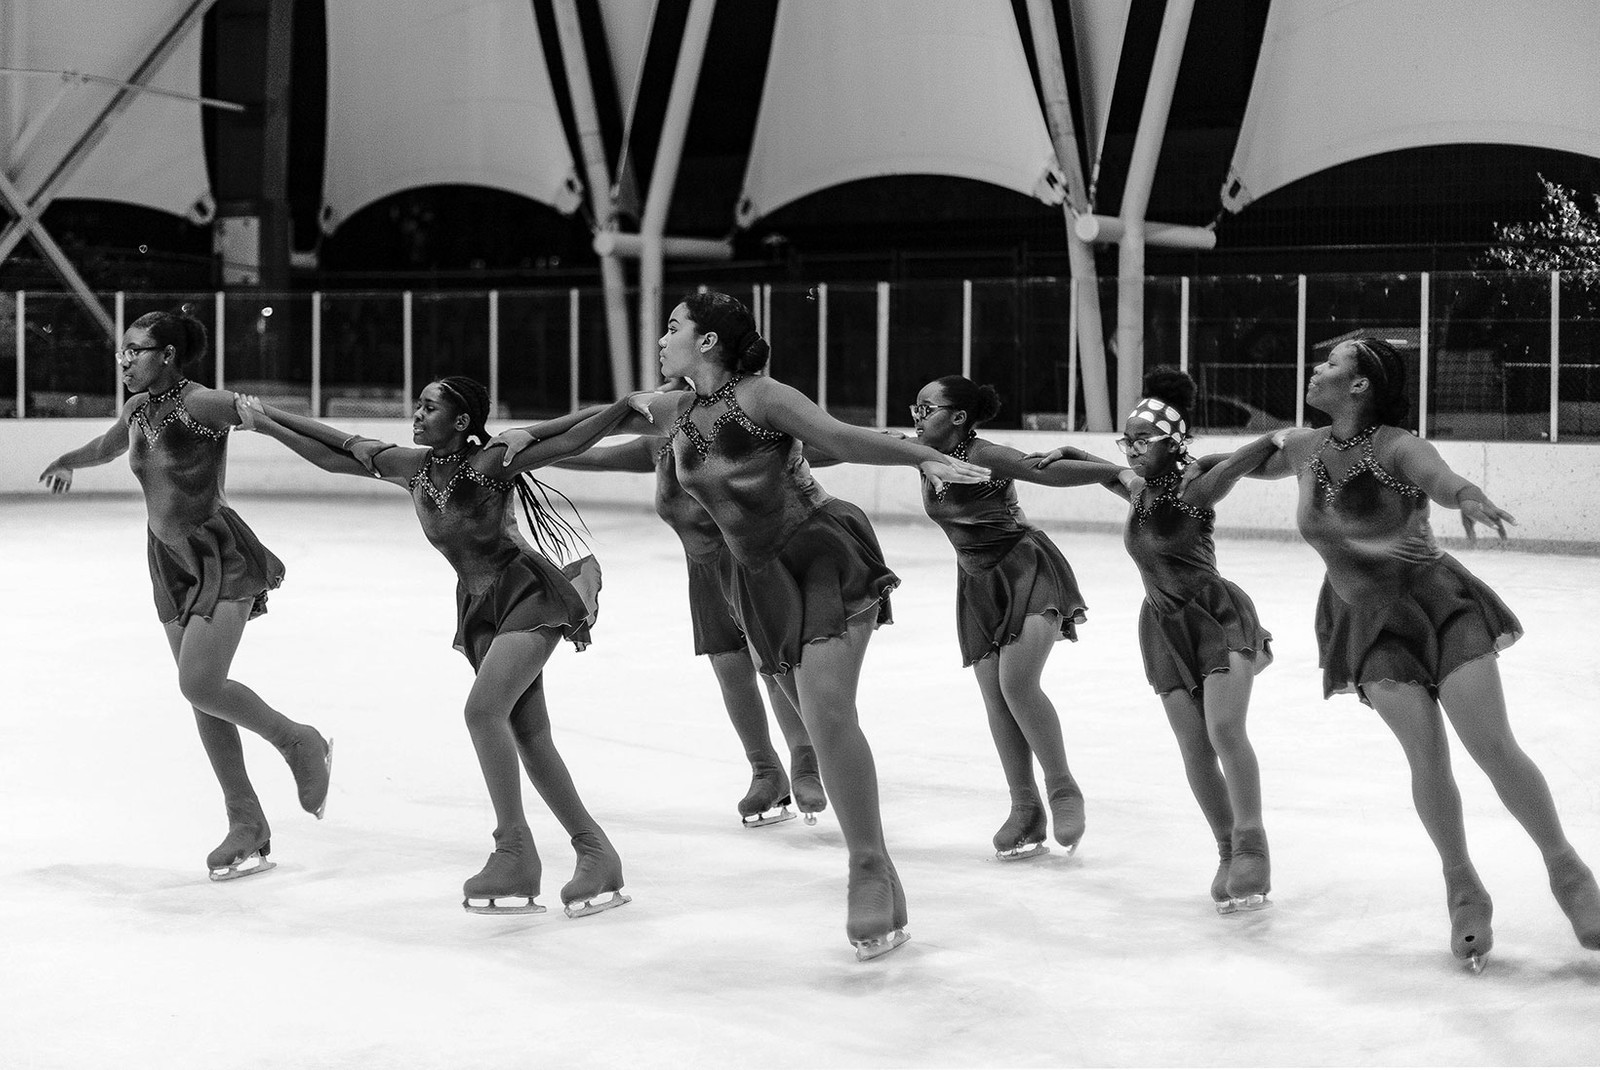 Flo Ngala Photographer Figure Skating Harlem New York Times